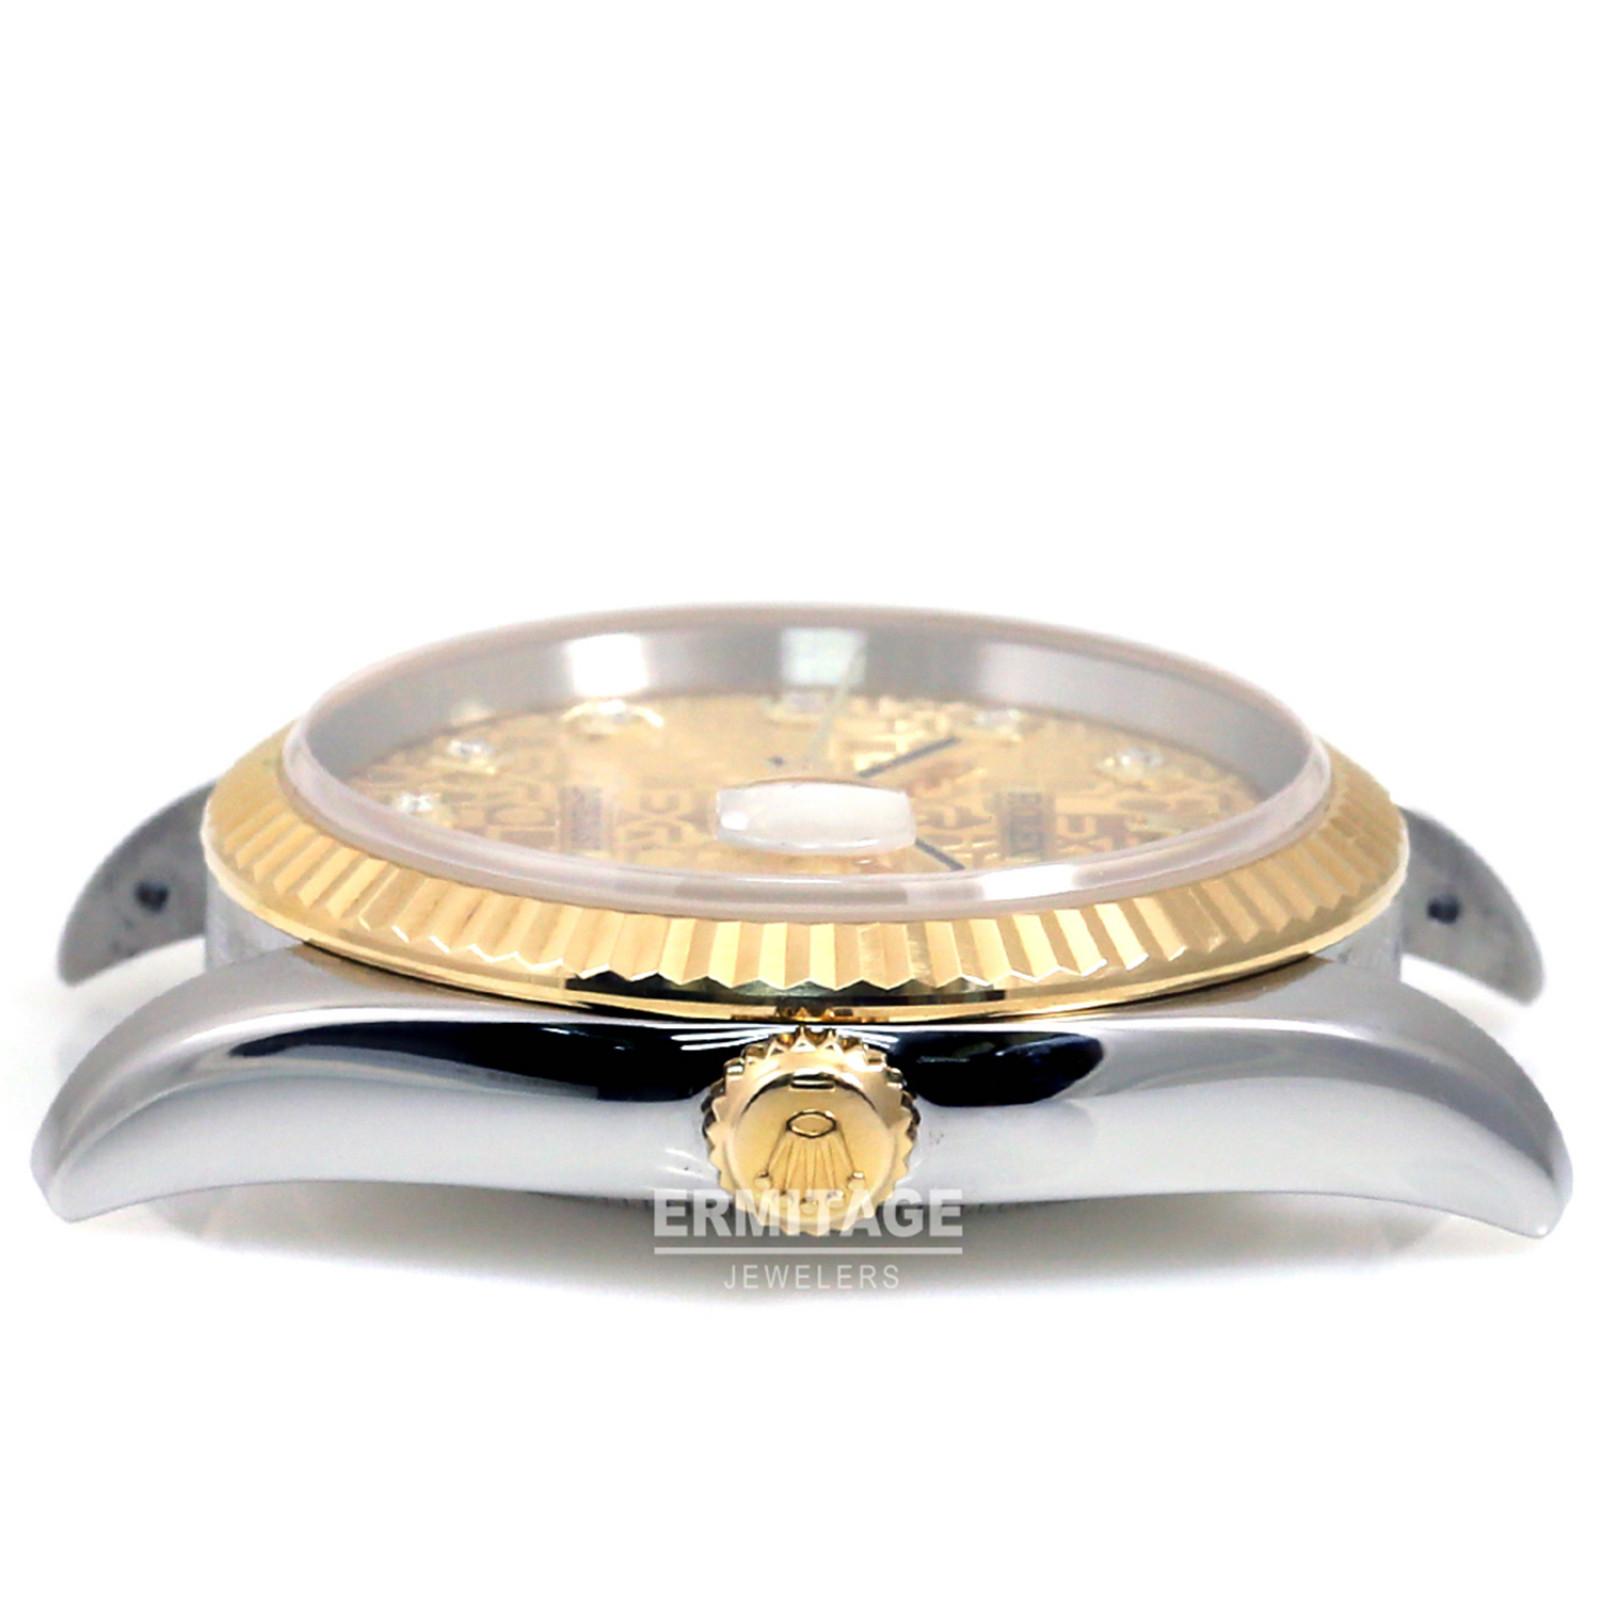 Rolex Datejust 116233 Gold & Steel with Diamonds